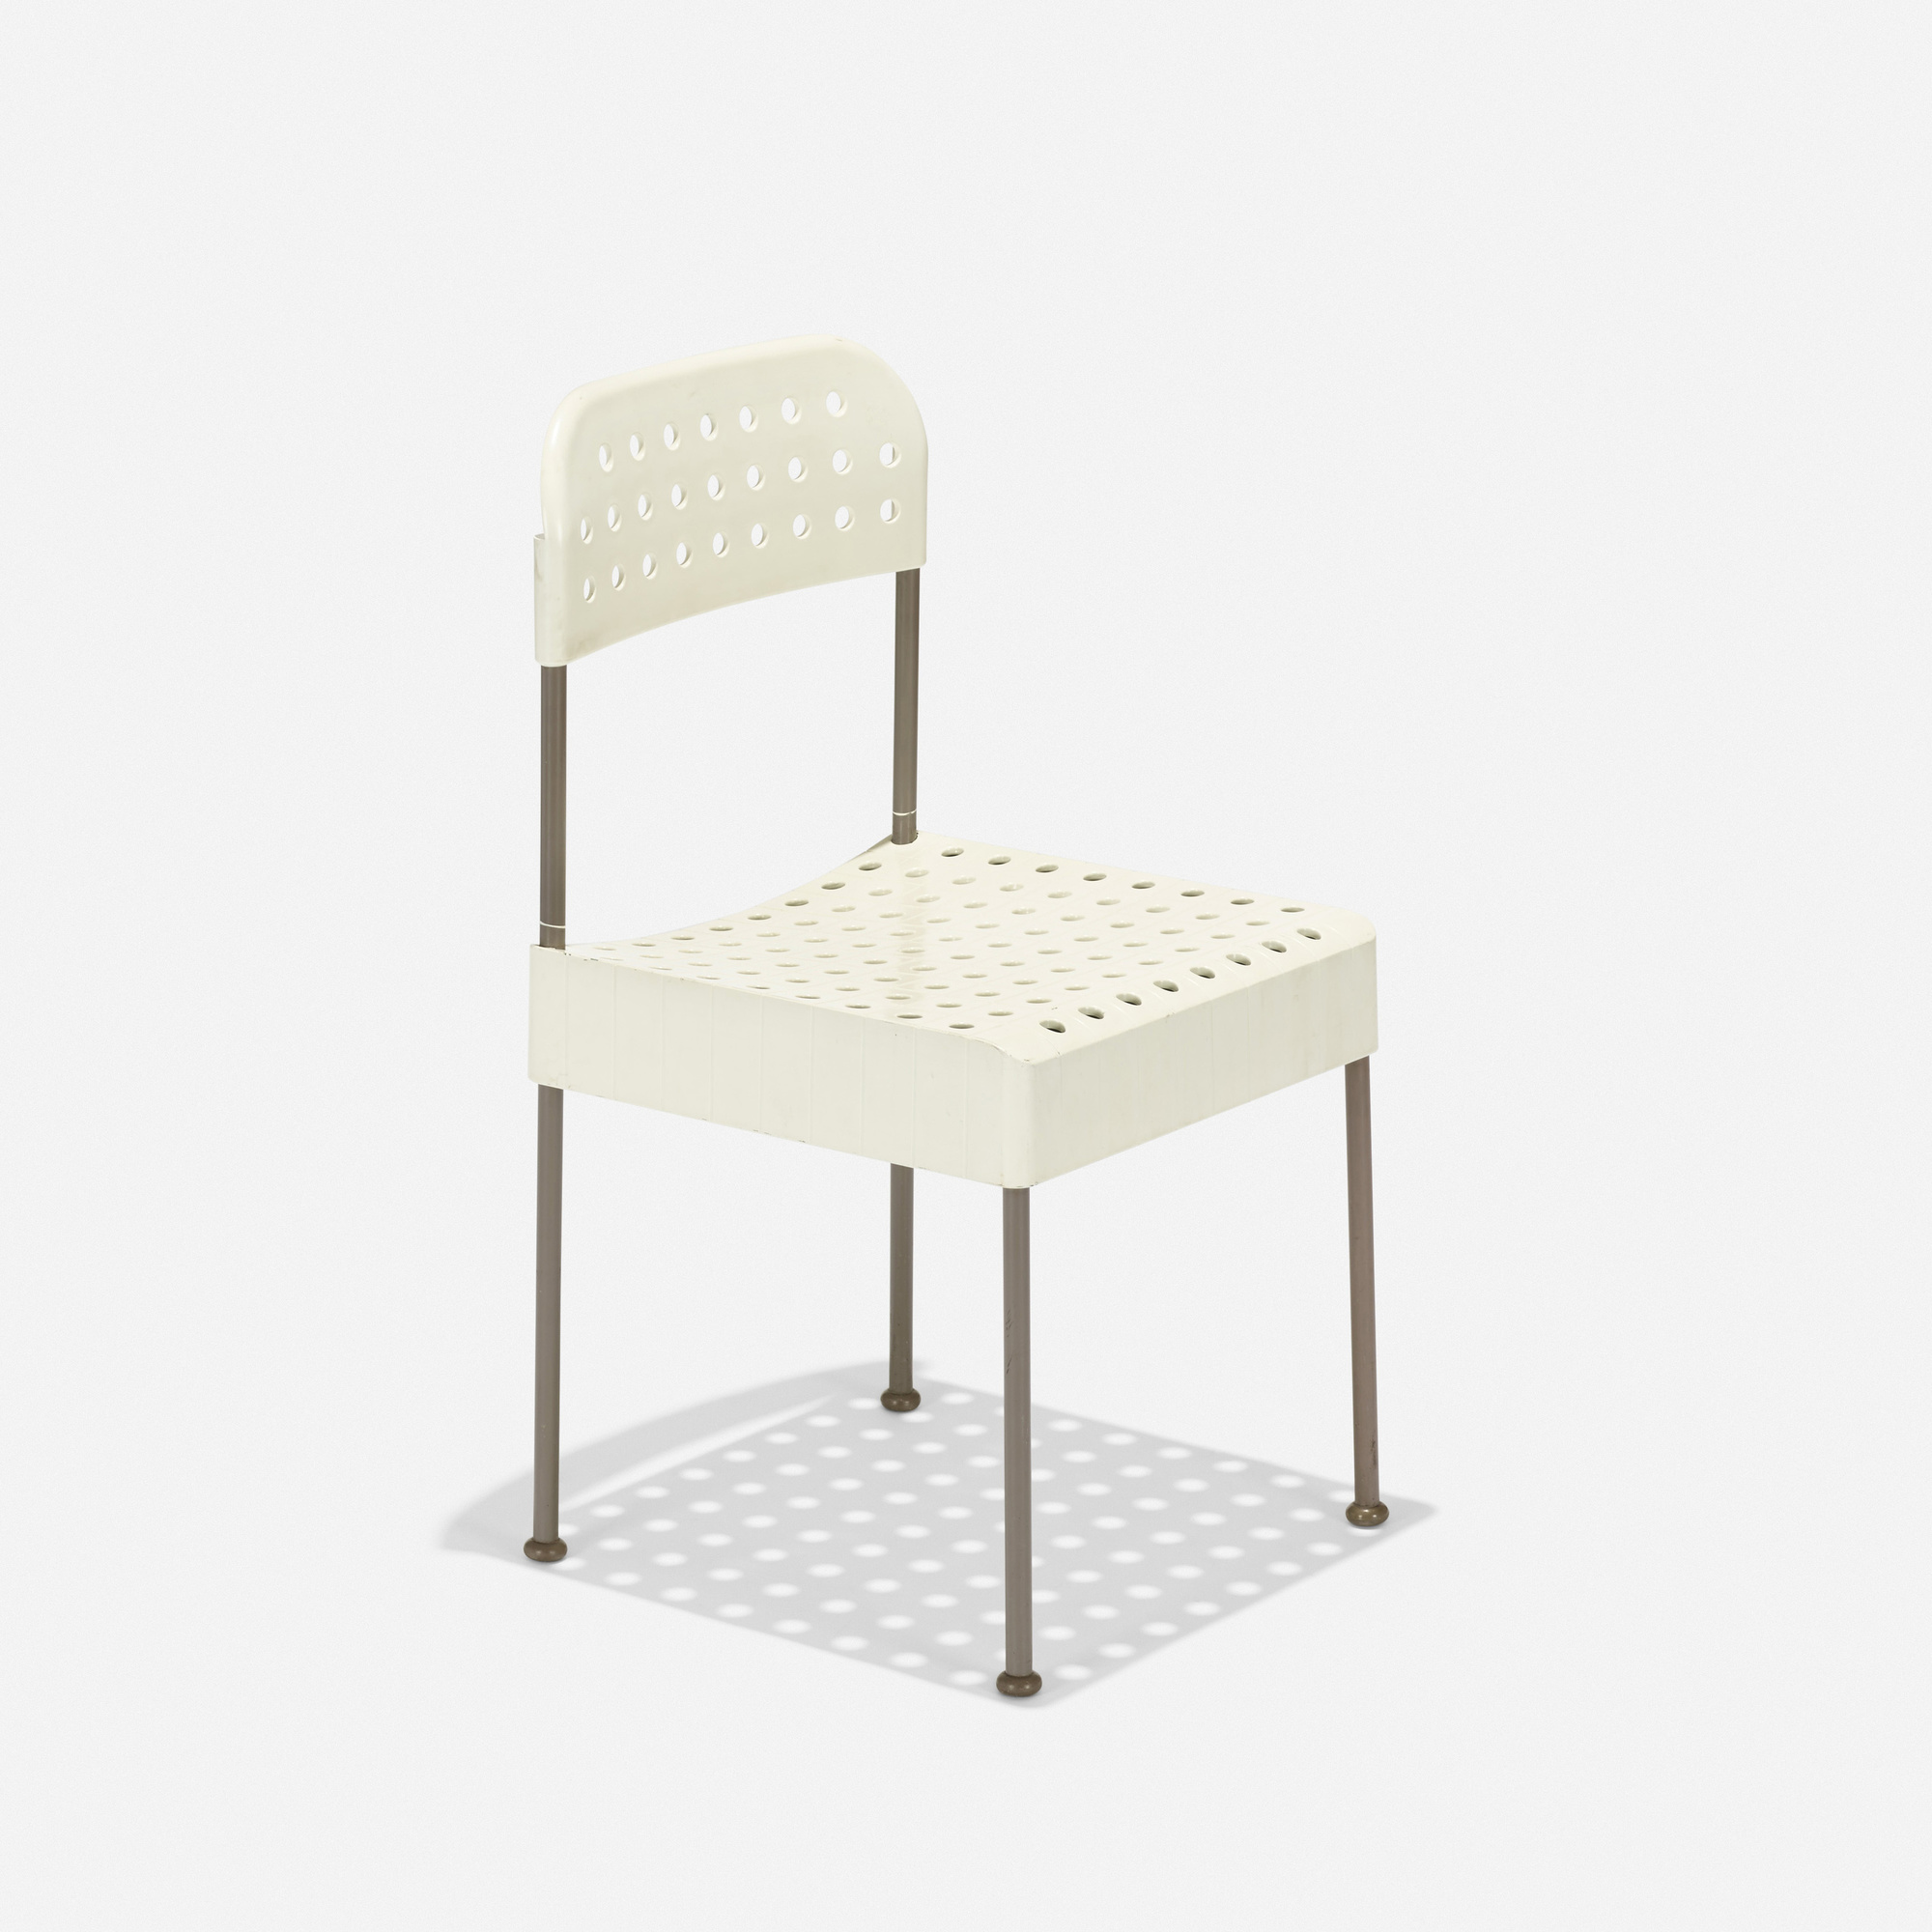 118: Enzo Mari / Box chair (1 of 3)